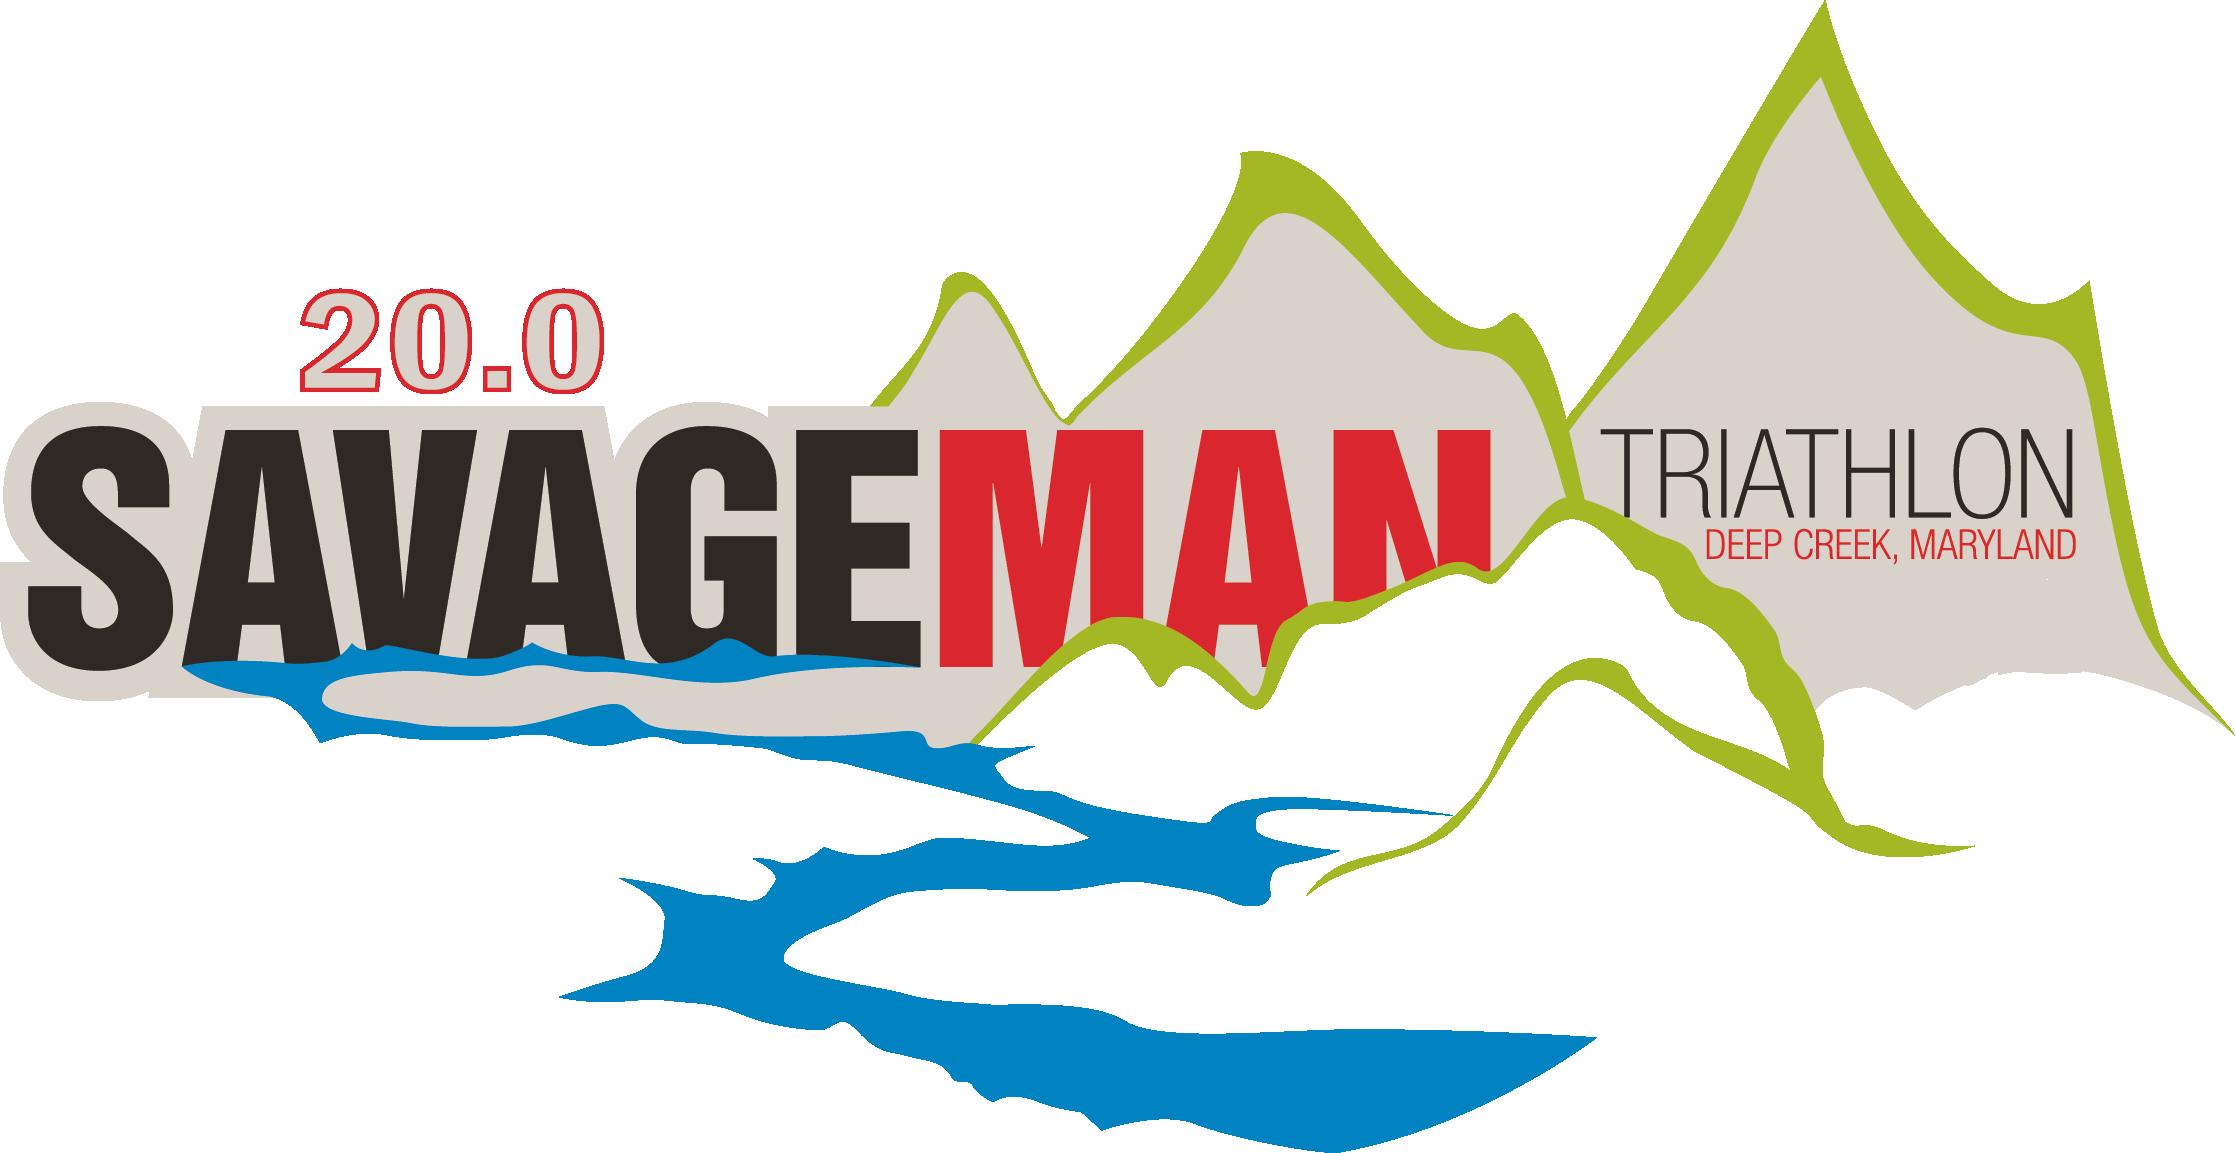 Savagman-Triathlon-No-Date20